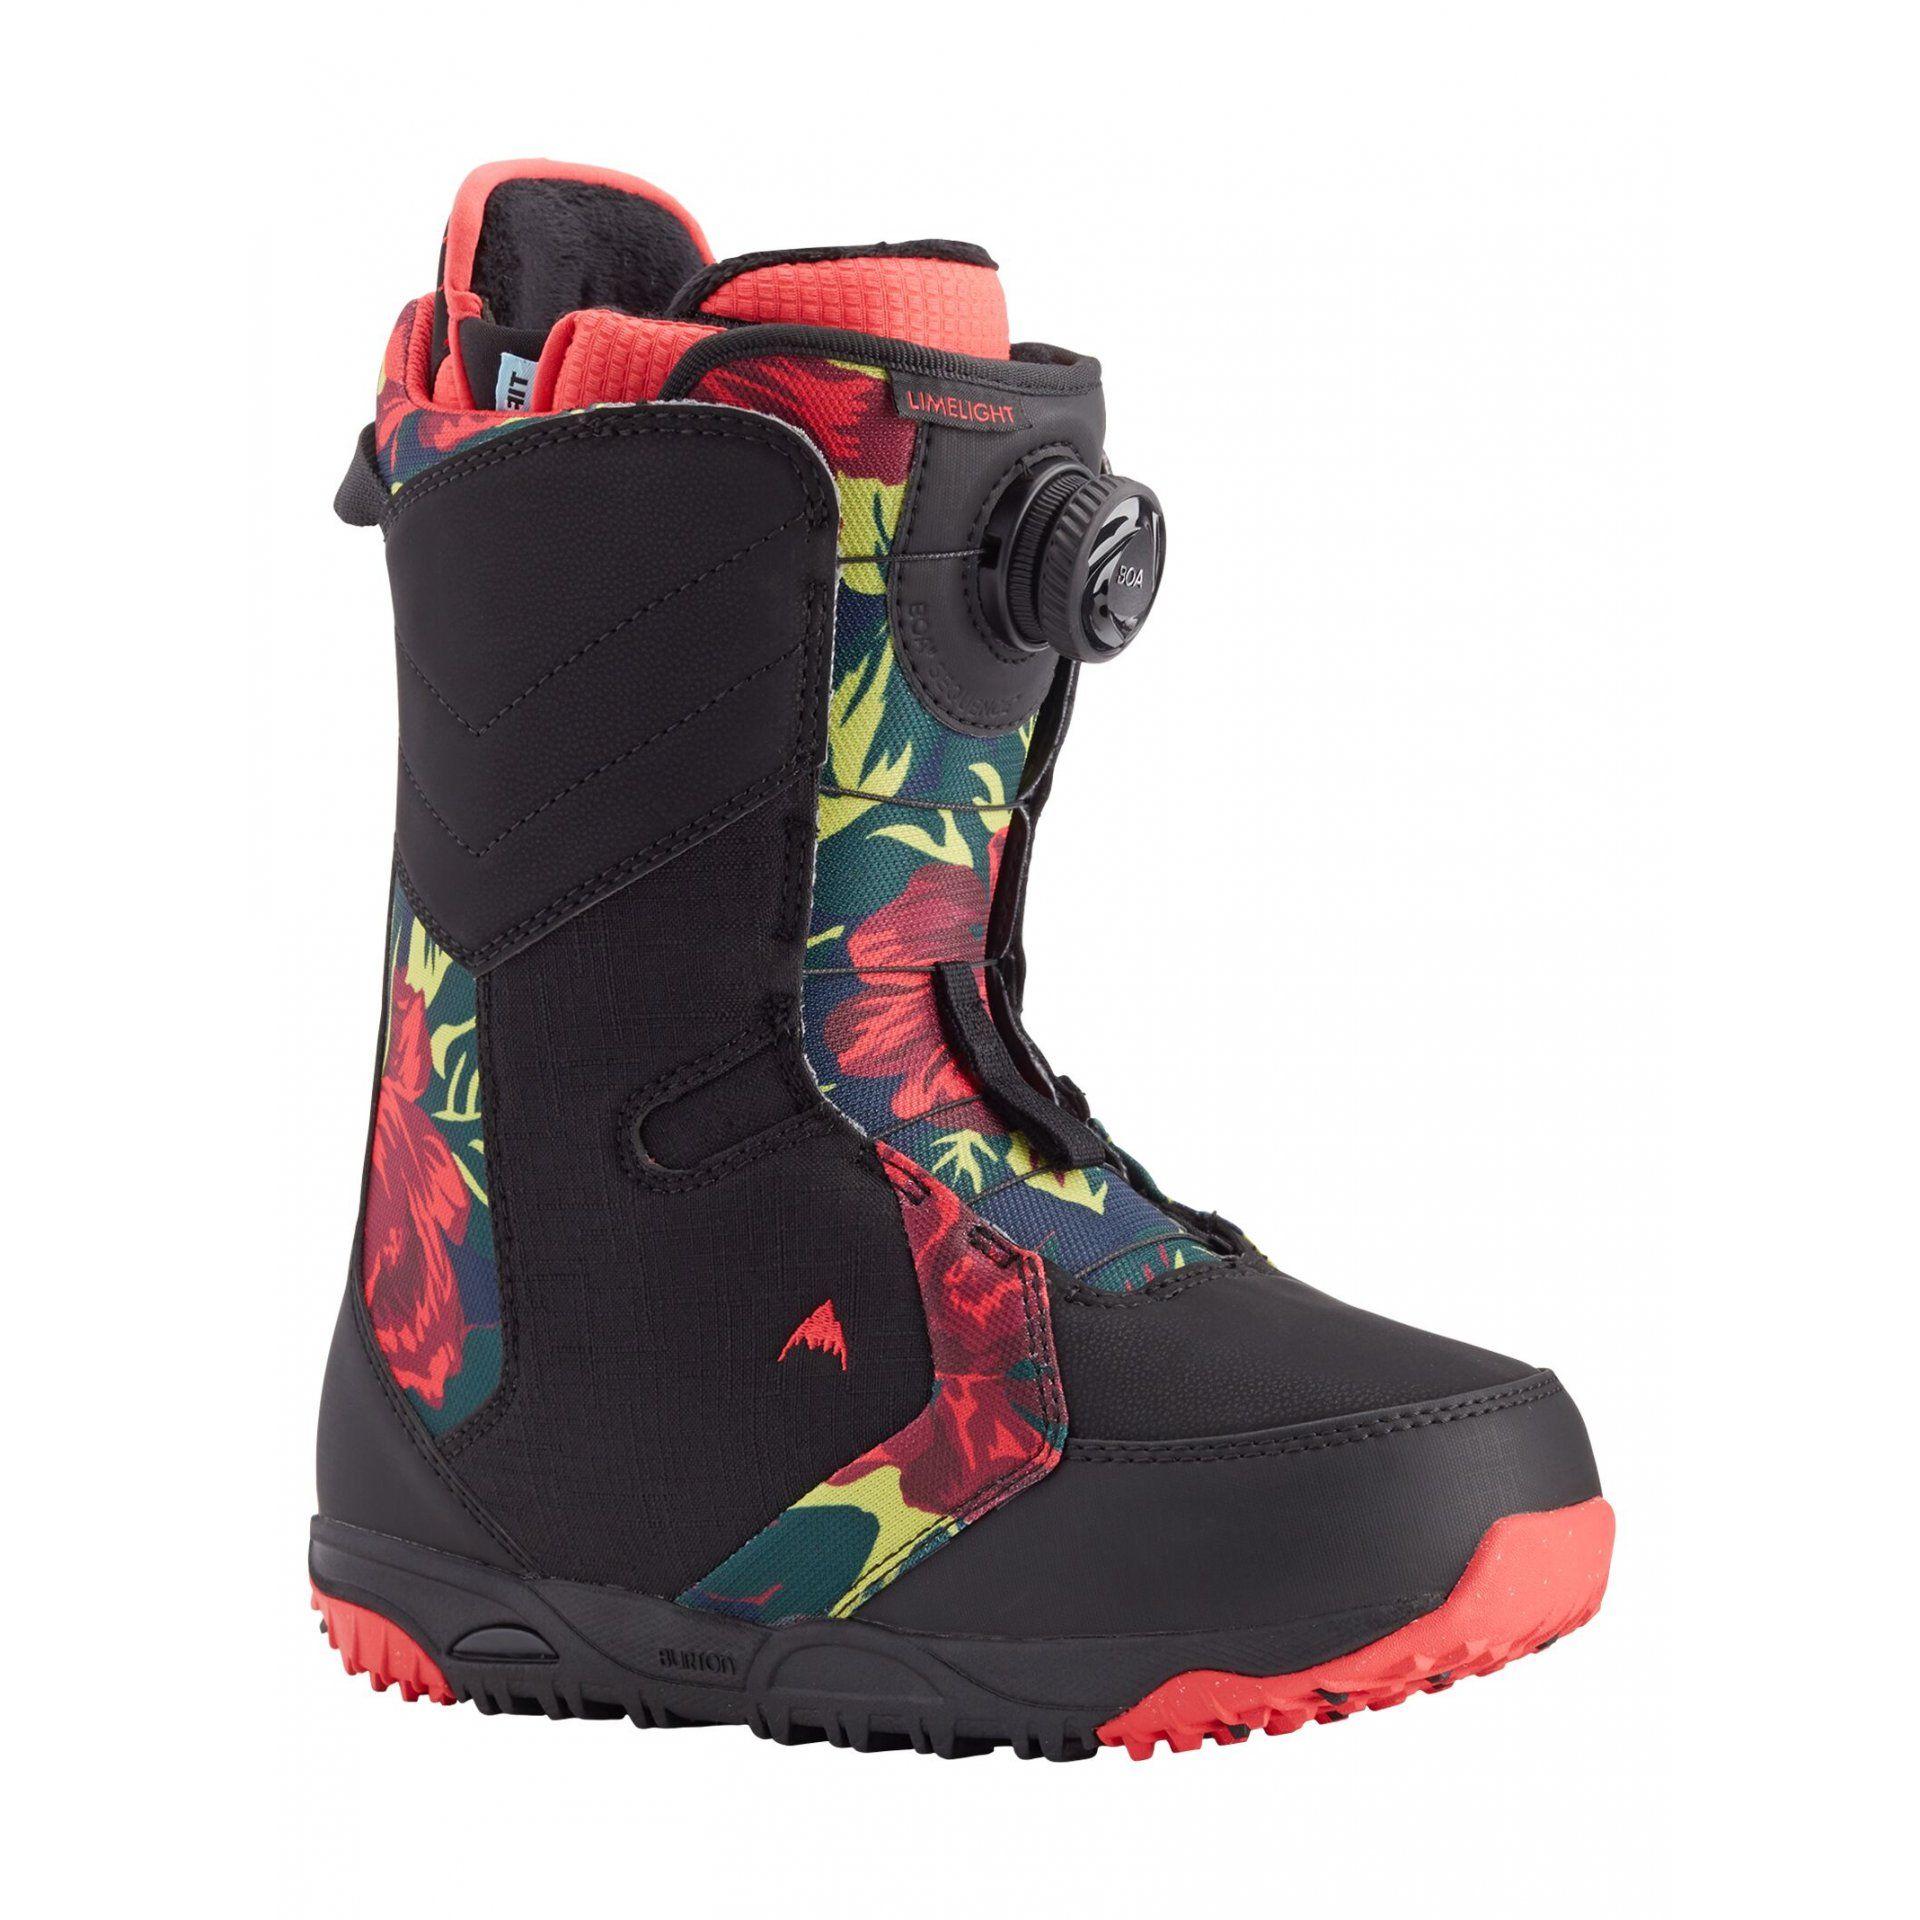 BUTY SNOWBOARDOWE BURTON LIMELIGHT BOA 150871-002 BLACK FLORAL 1